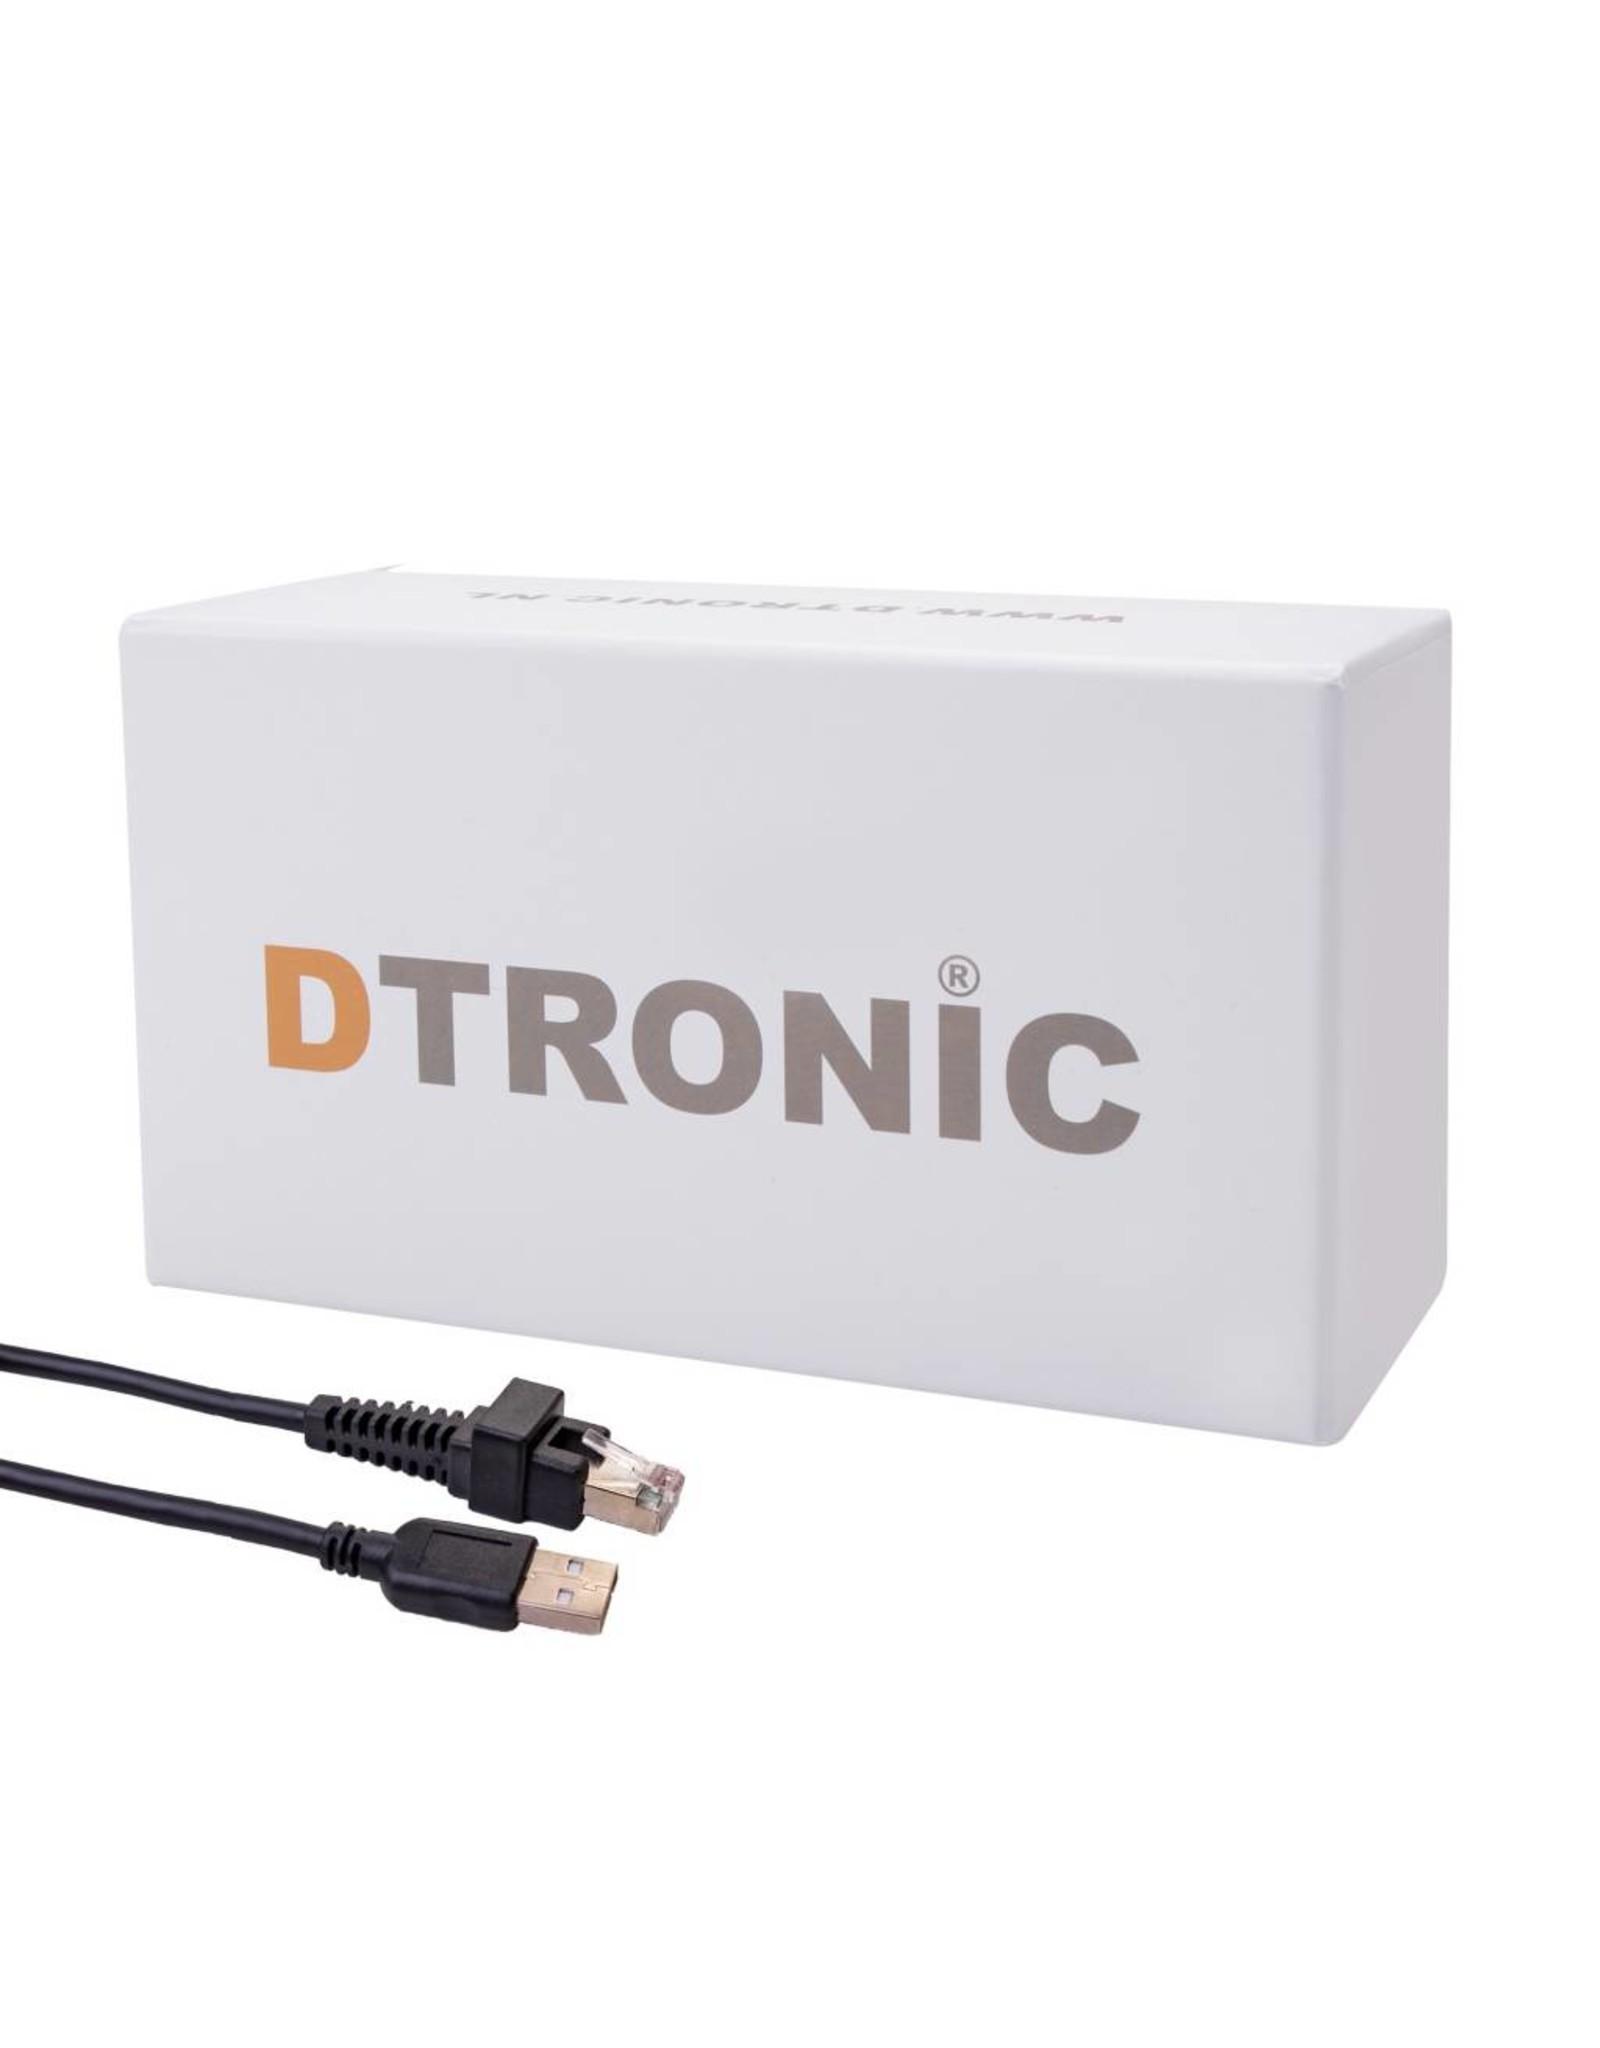 DTRONIC DTRONIC - USB 3